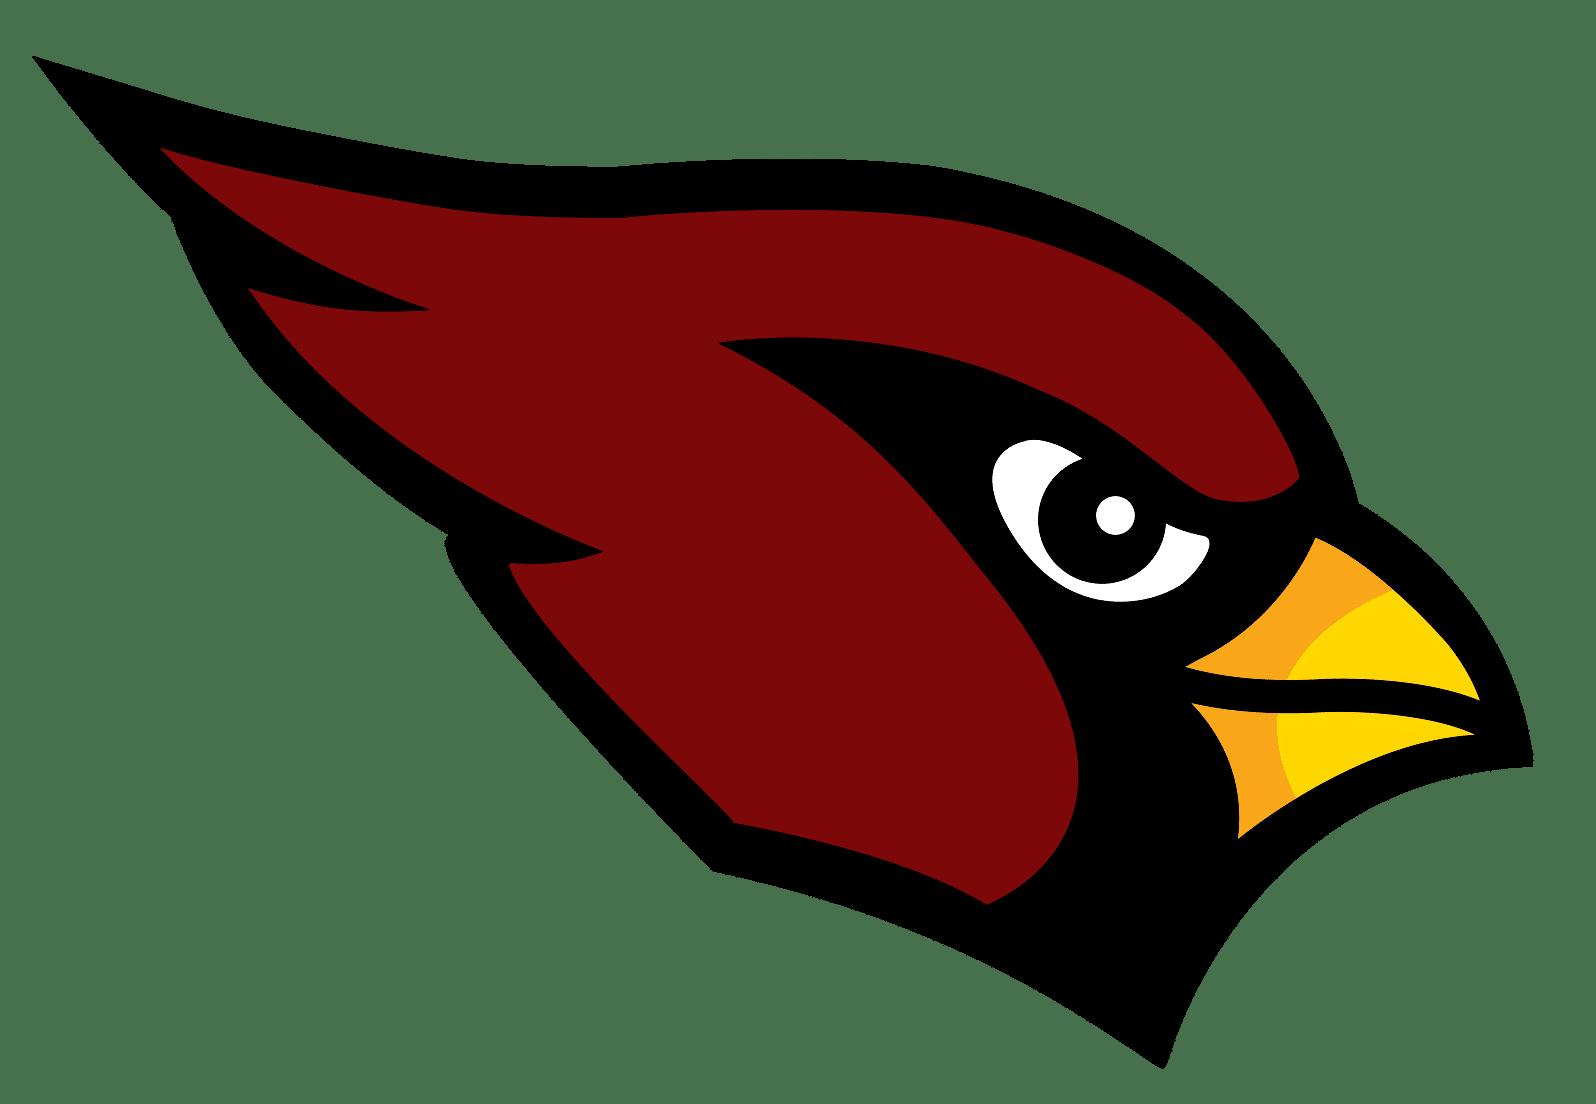 Mayville_Cardinal